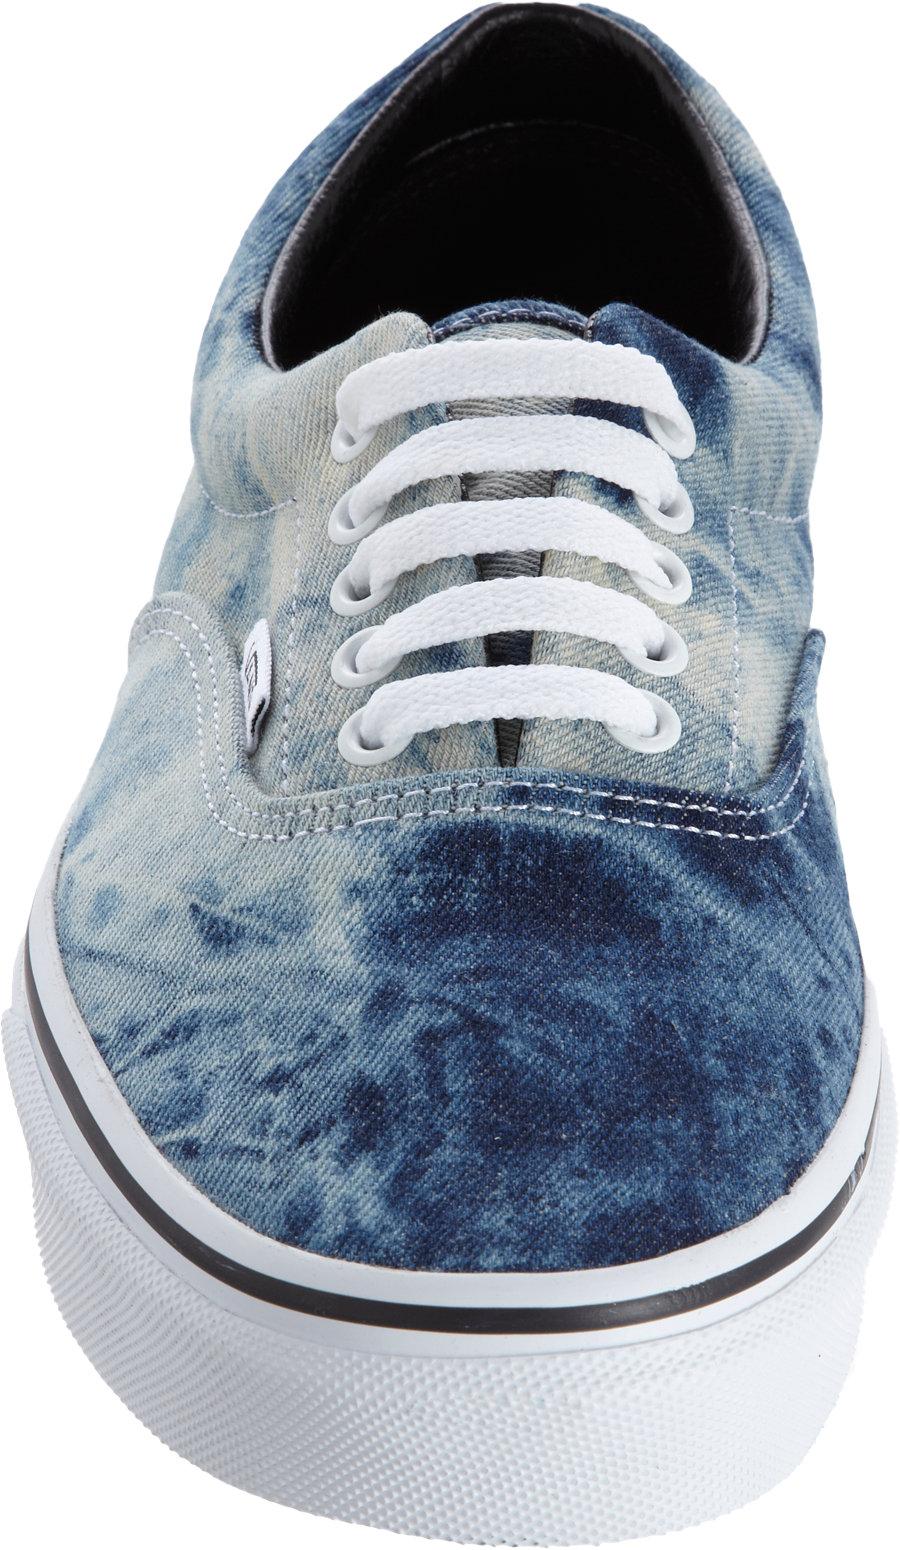 Lyst Vans Acid Denim Era In Blue For Men